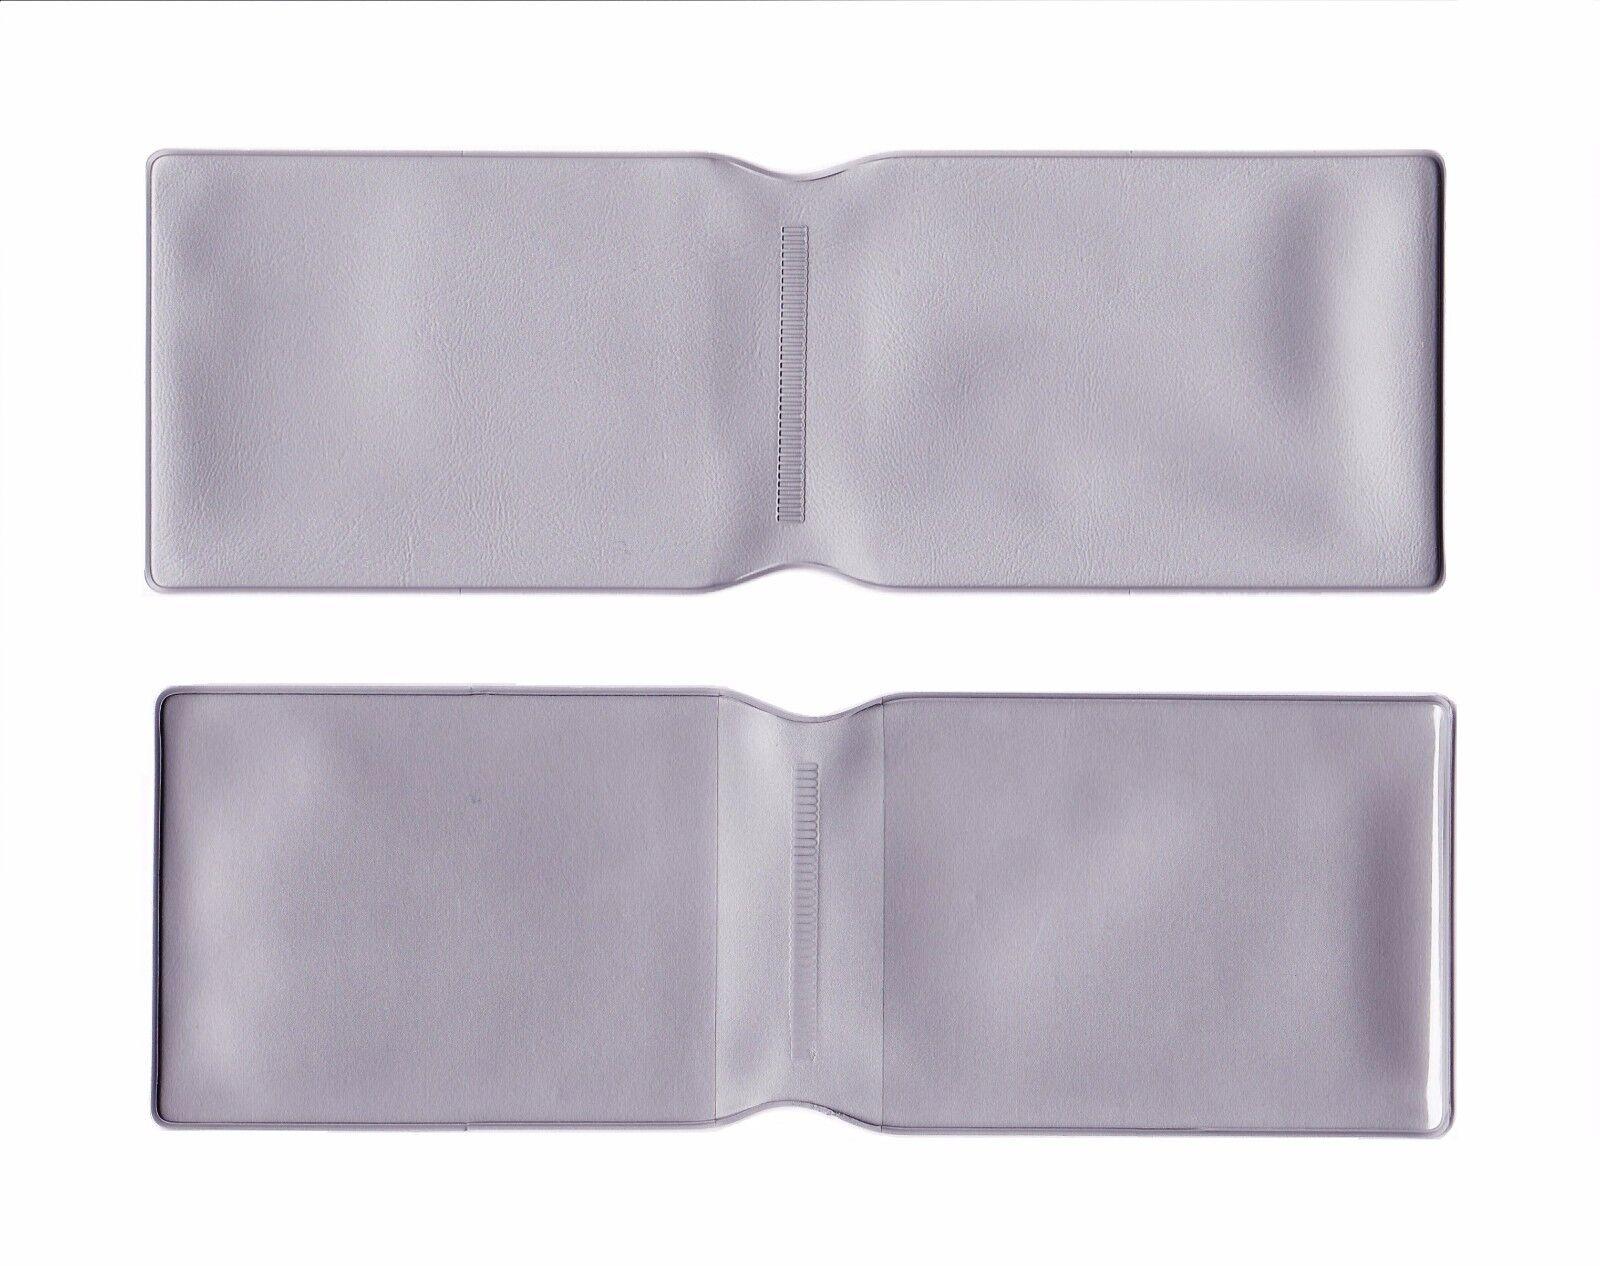 100 X Plástico Ostra Tarjeta Billetera Billetera Billetera De Plata/Soporte/Cubierta dedb17